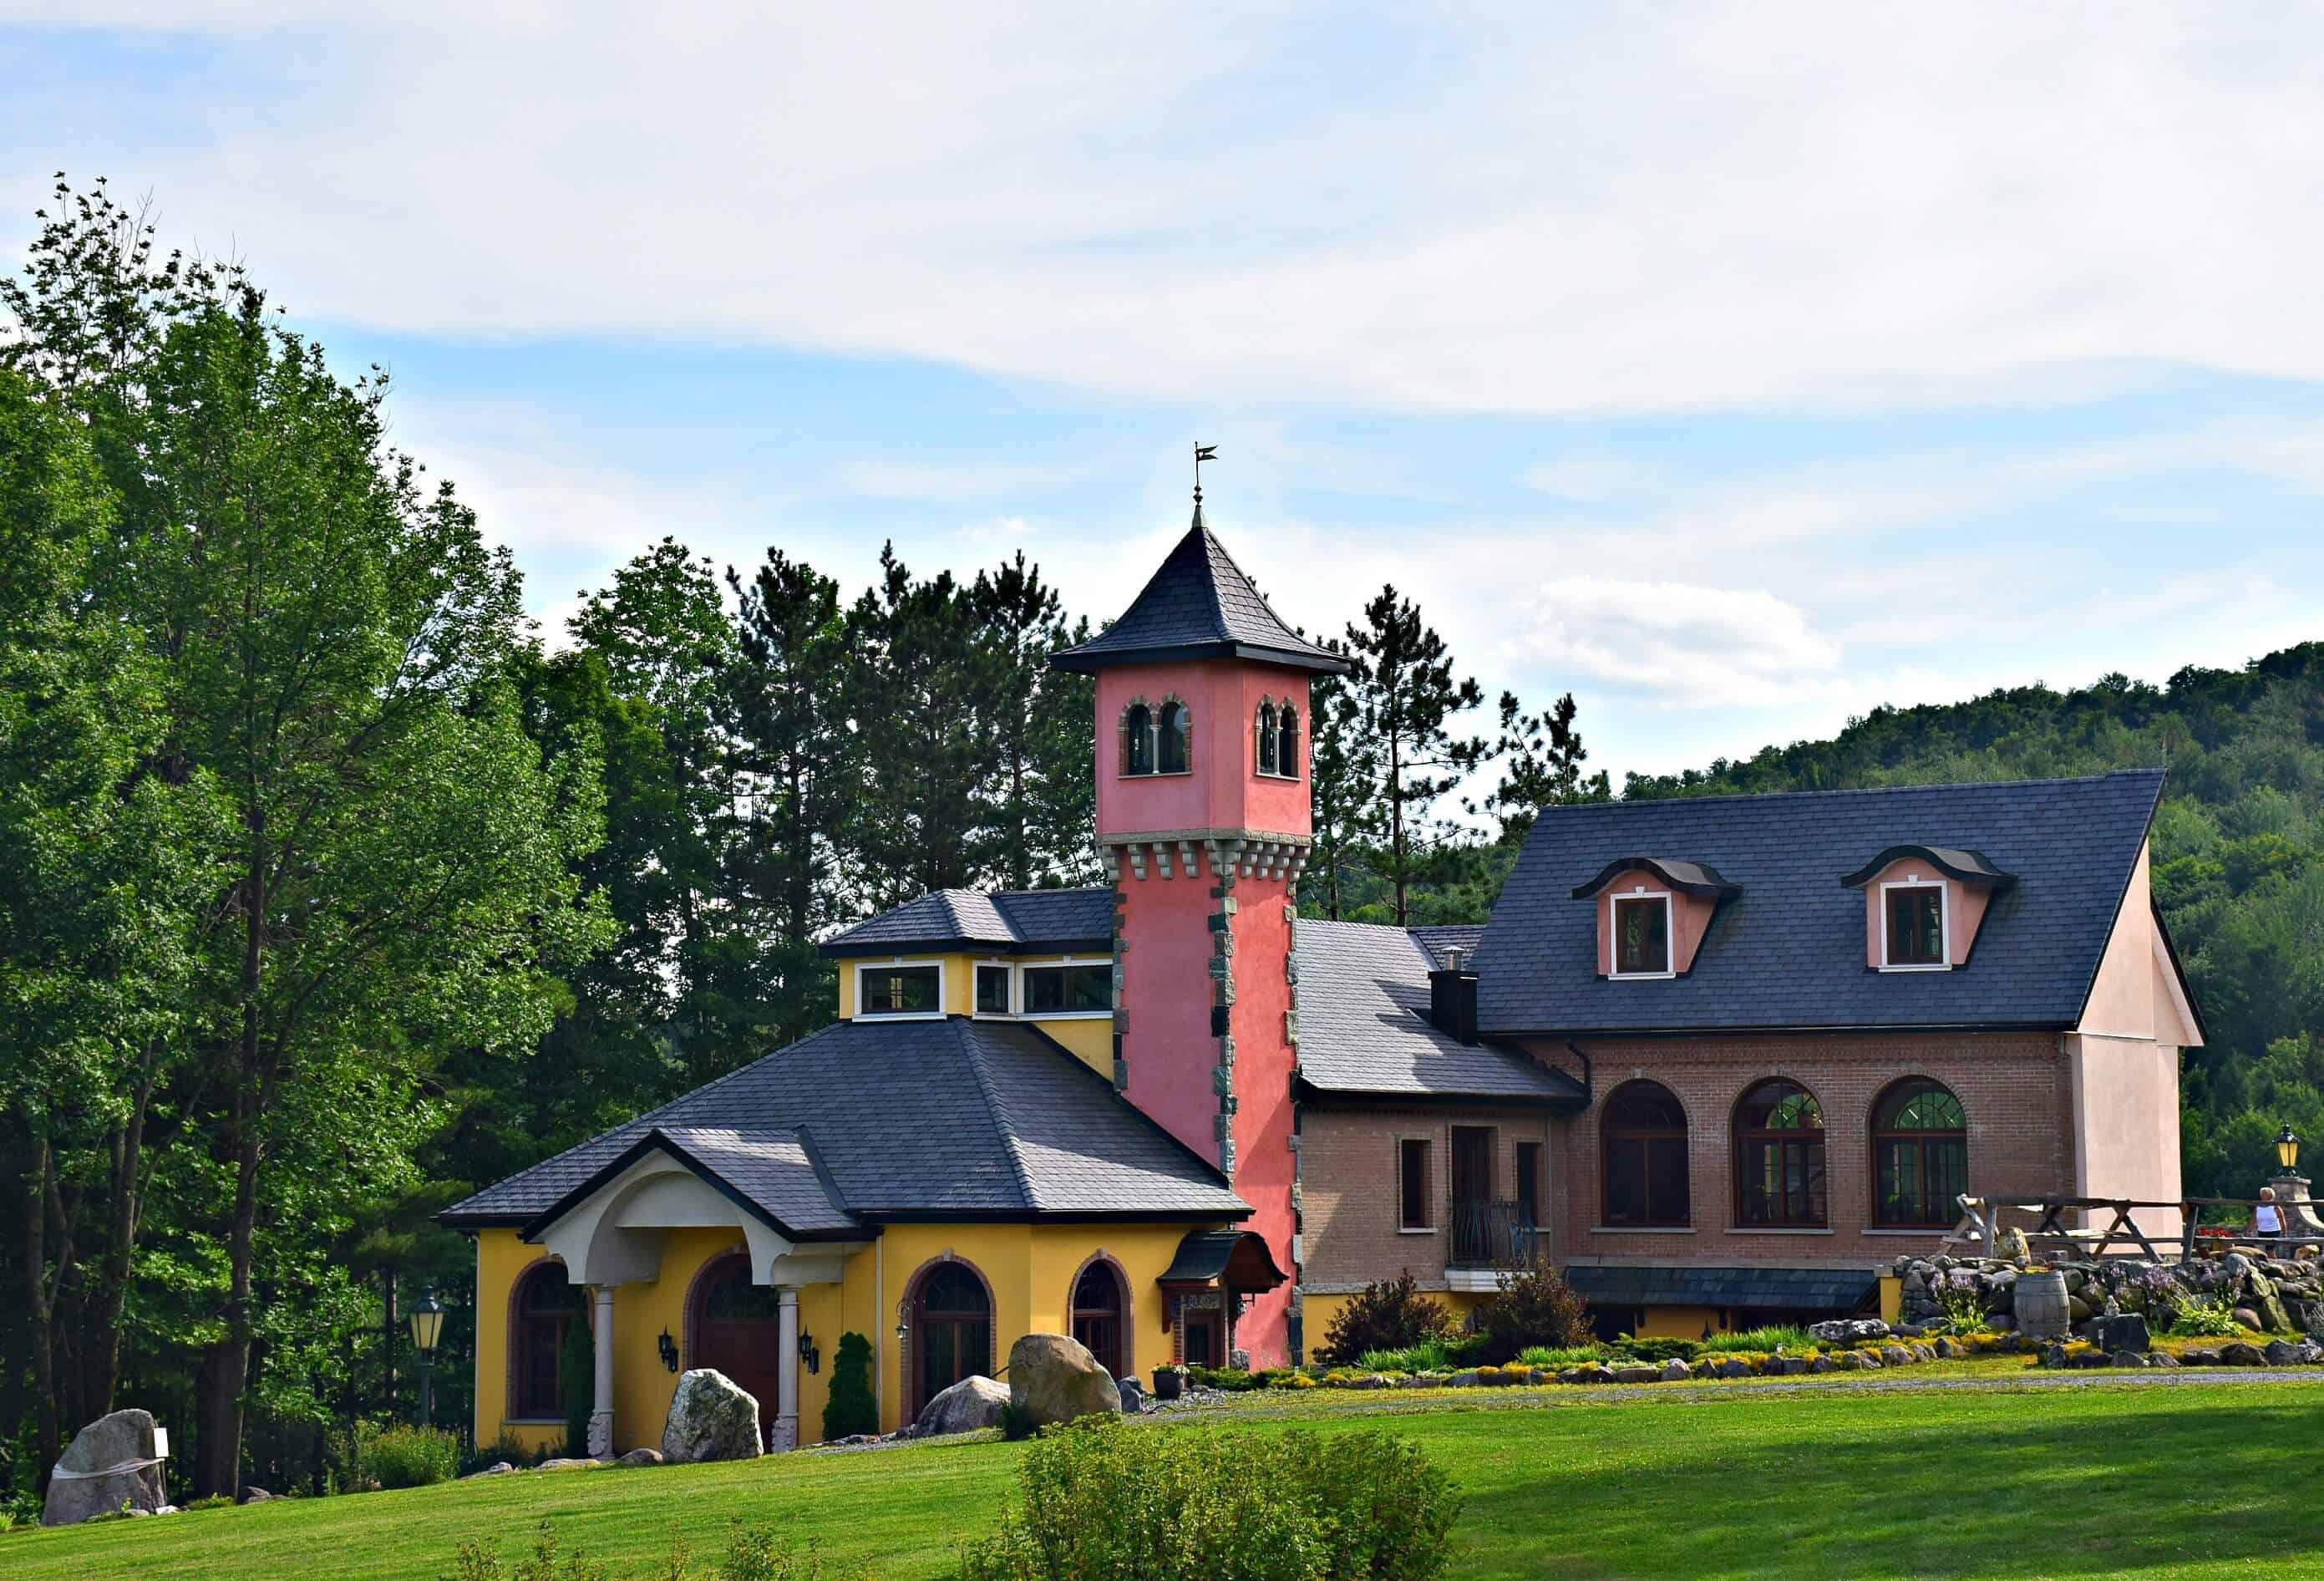 Chapelle Ste Agnes Vineyard, Quebec